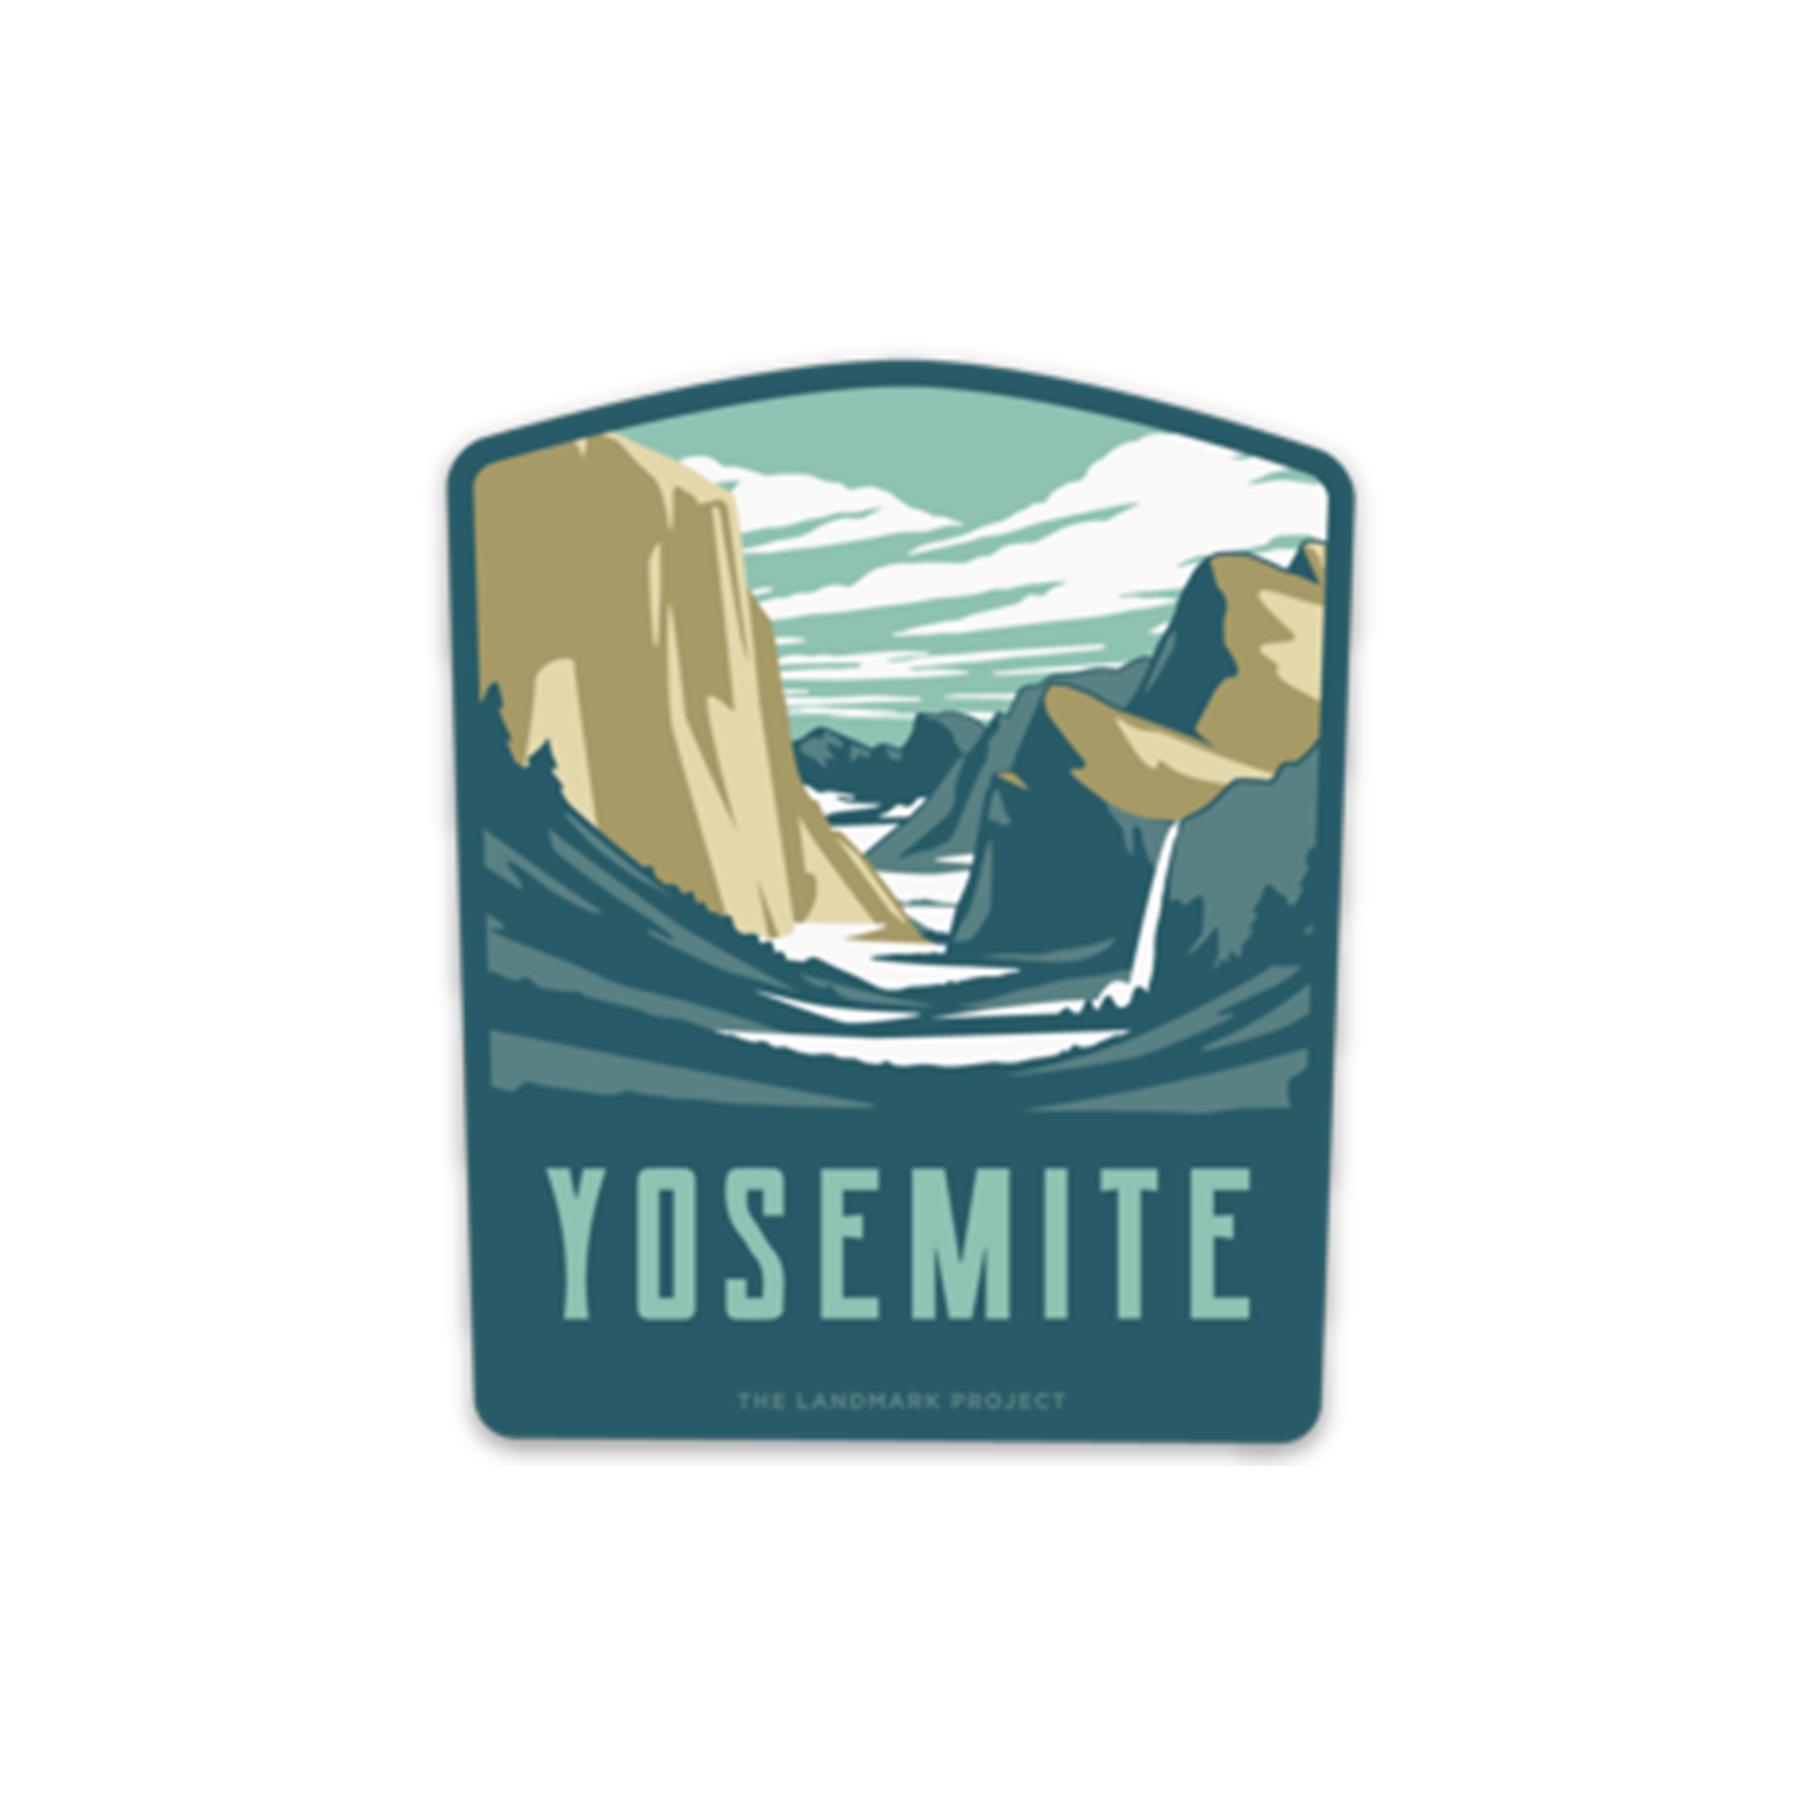 yosemite-sticker-2.jpg